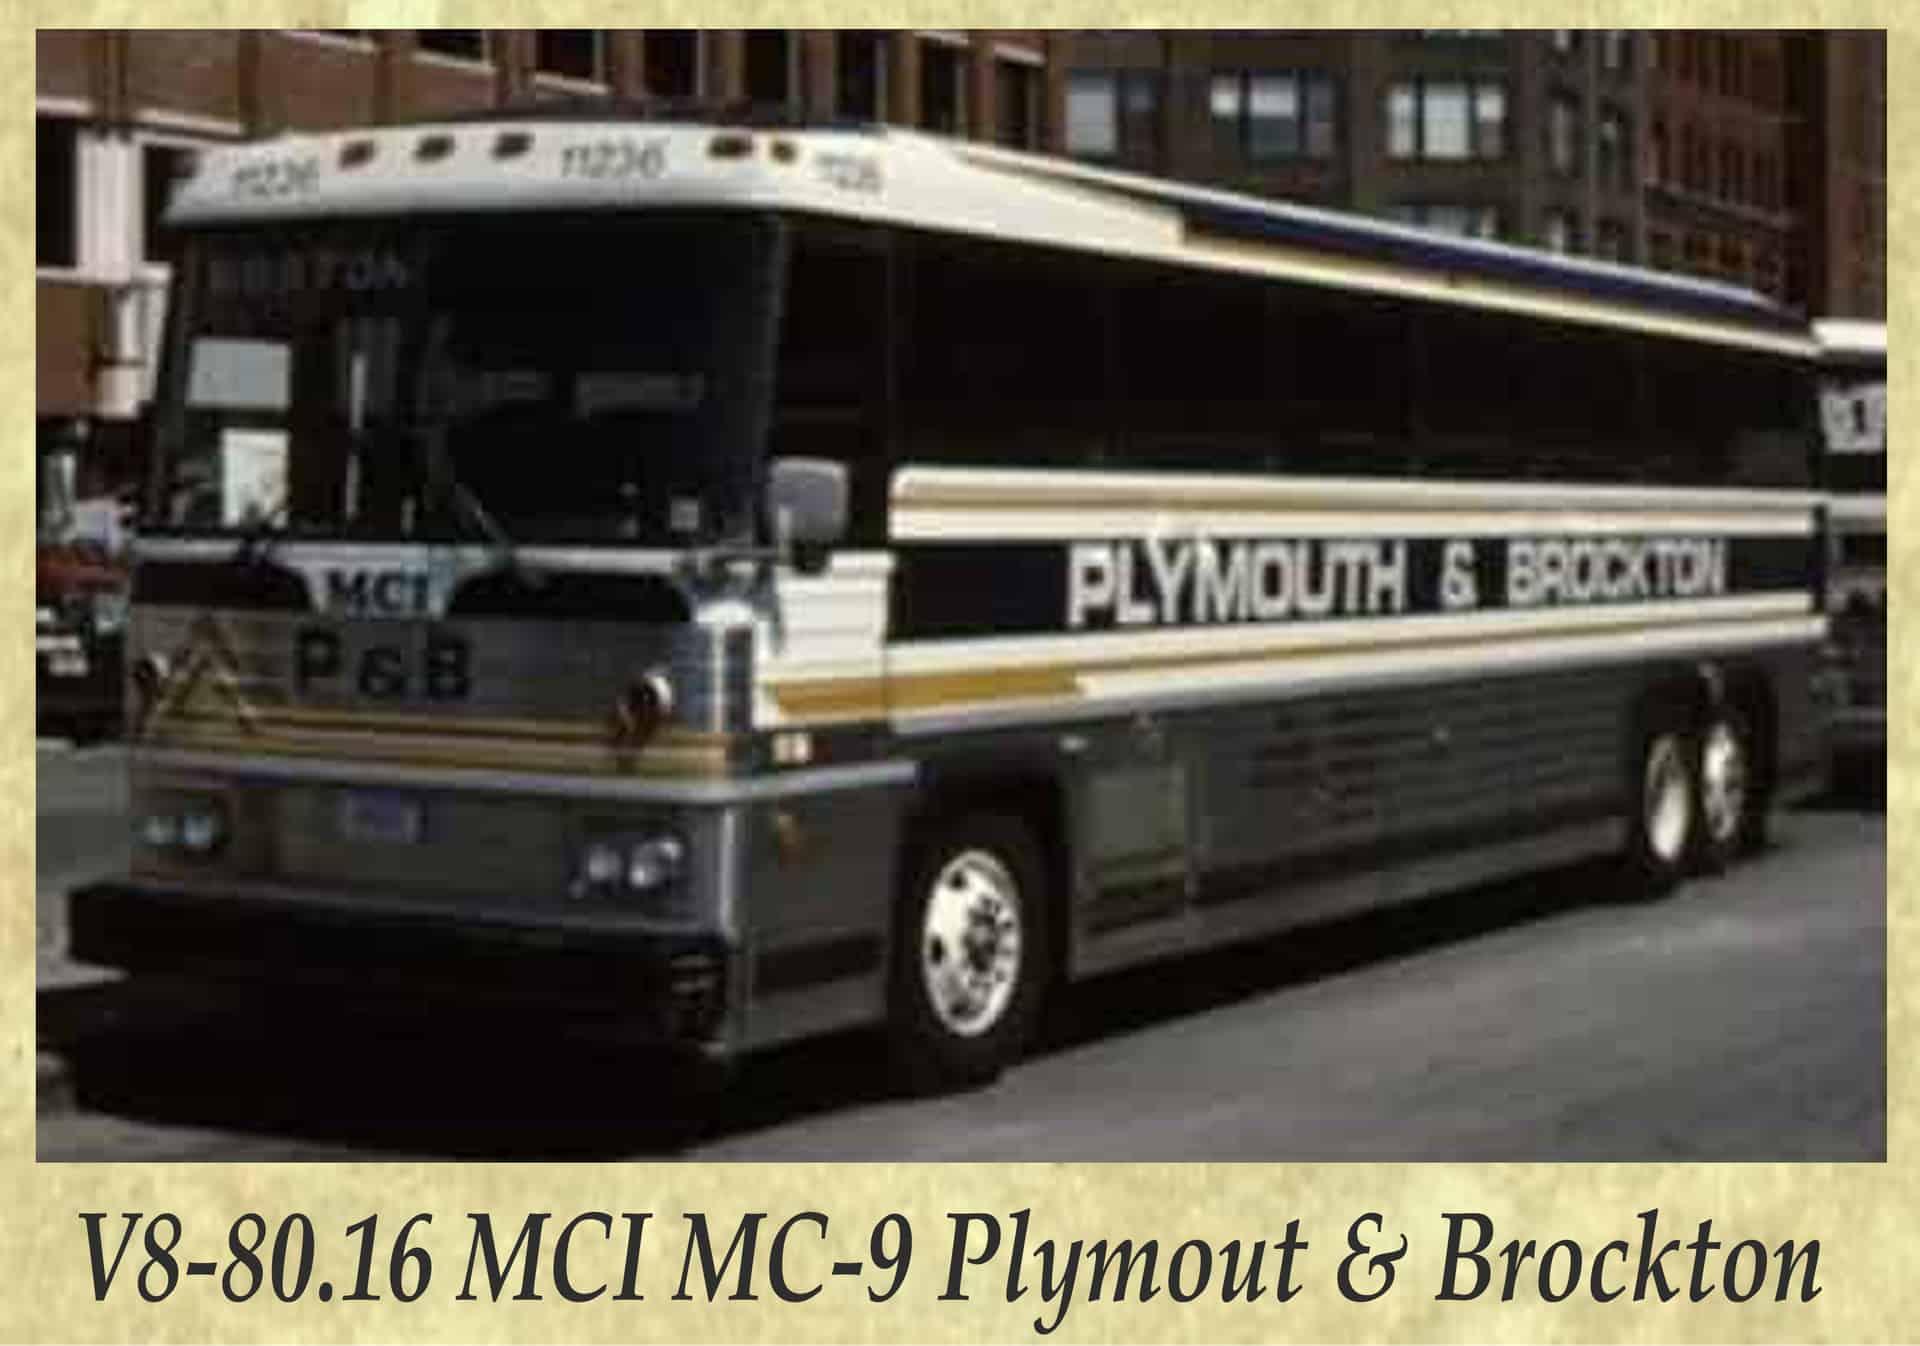 V8-80.16 MCI MC-9 Plymout & Brockton